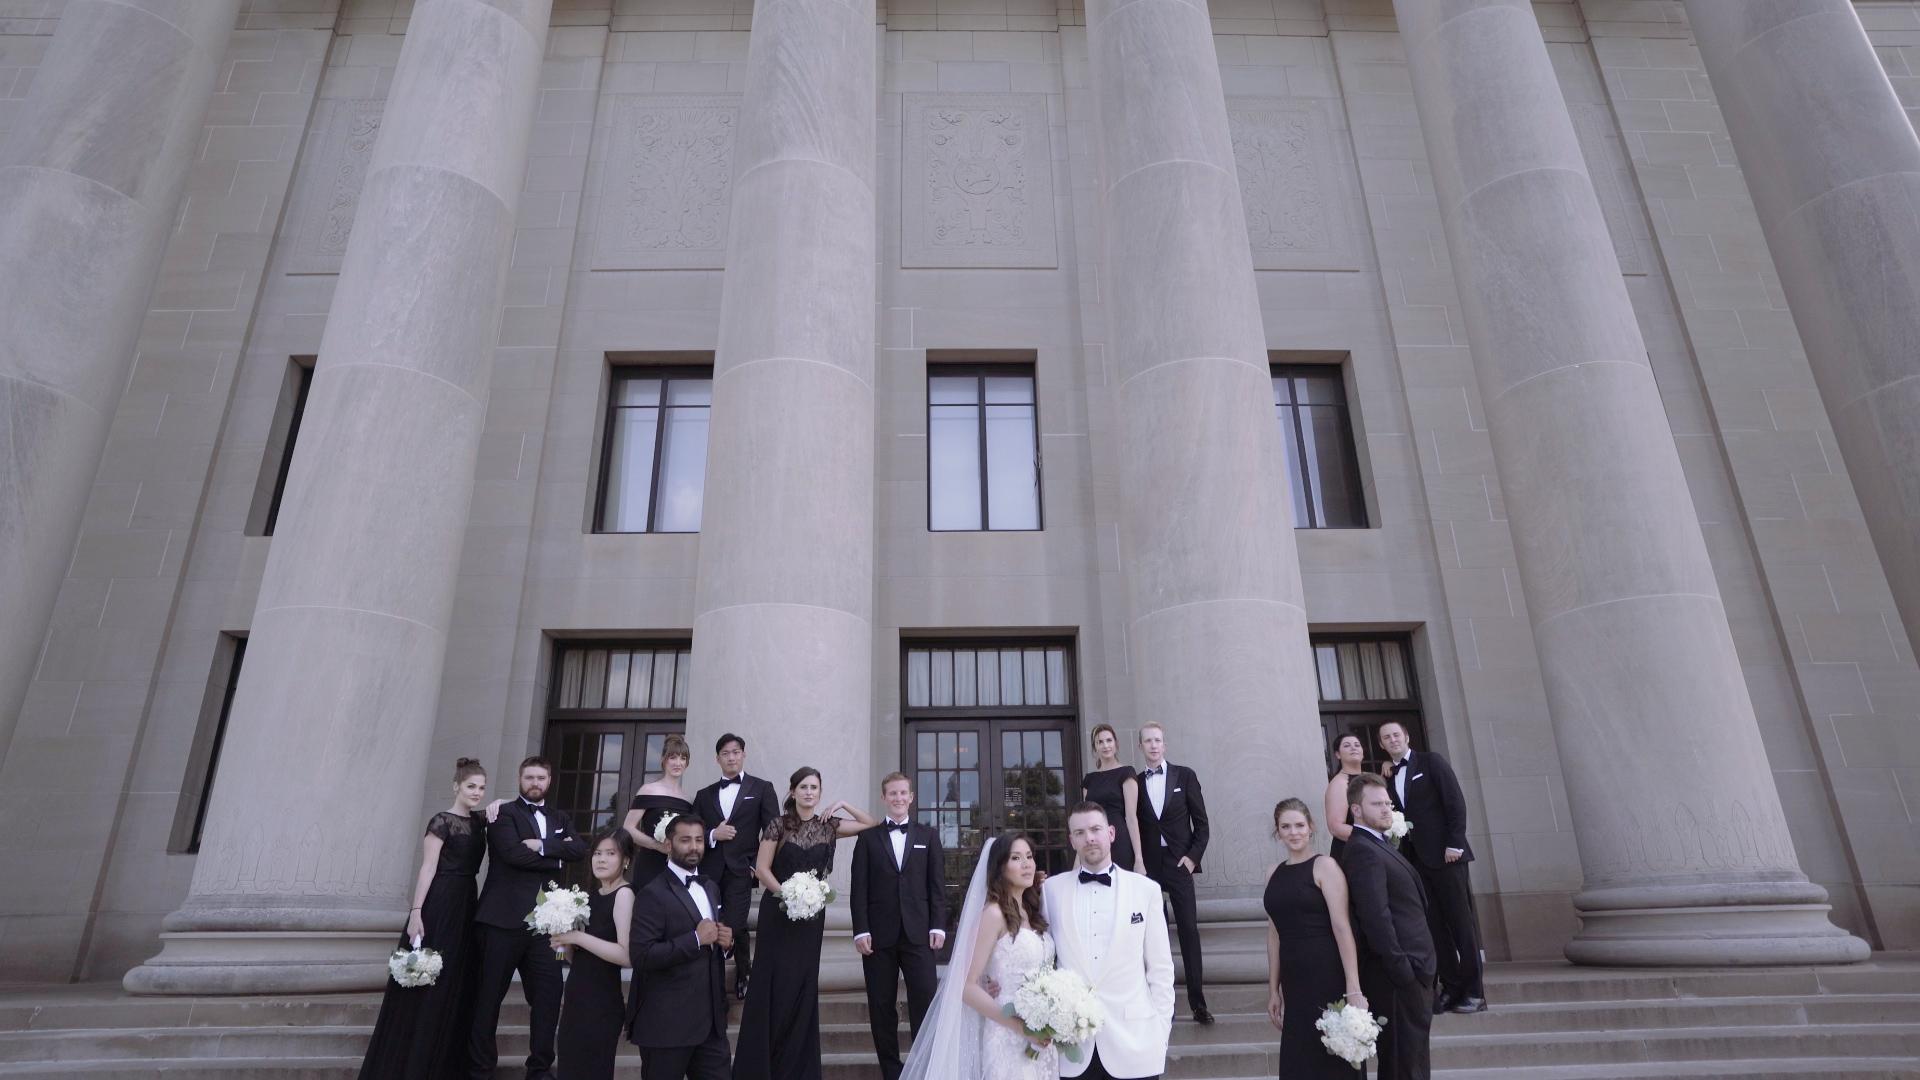 Nelson-Atkins Museum Of Art wedding photo